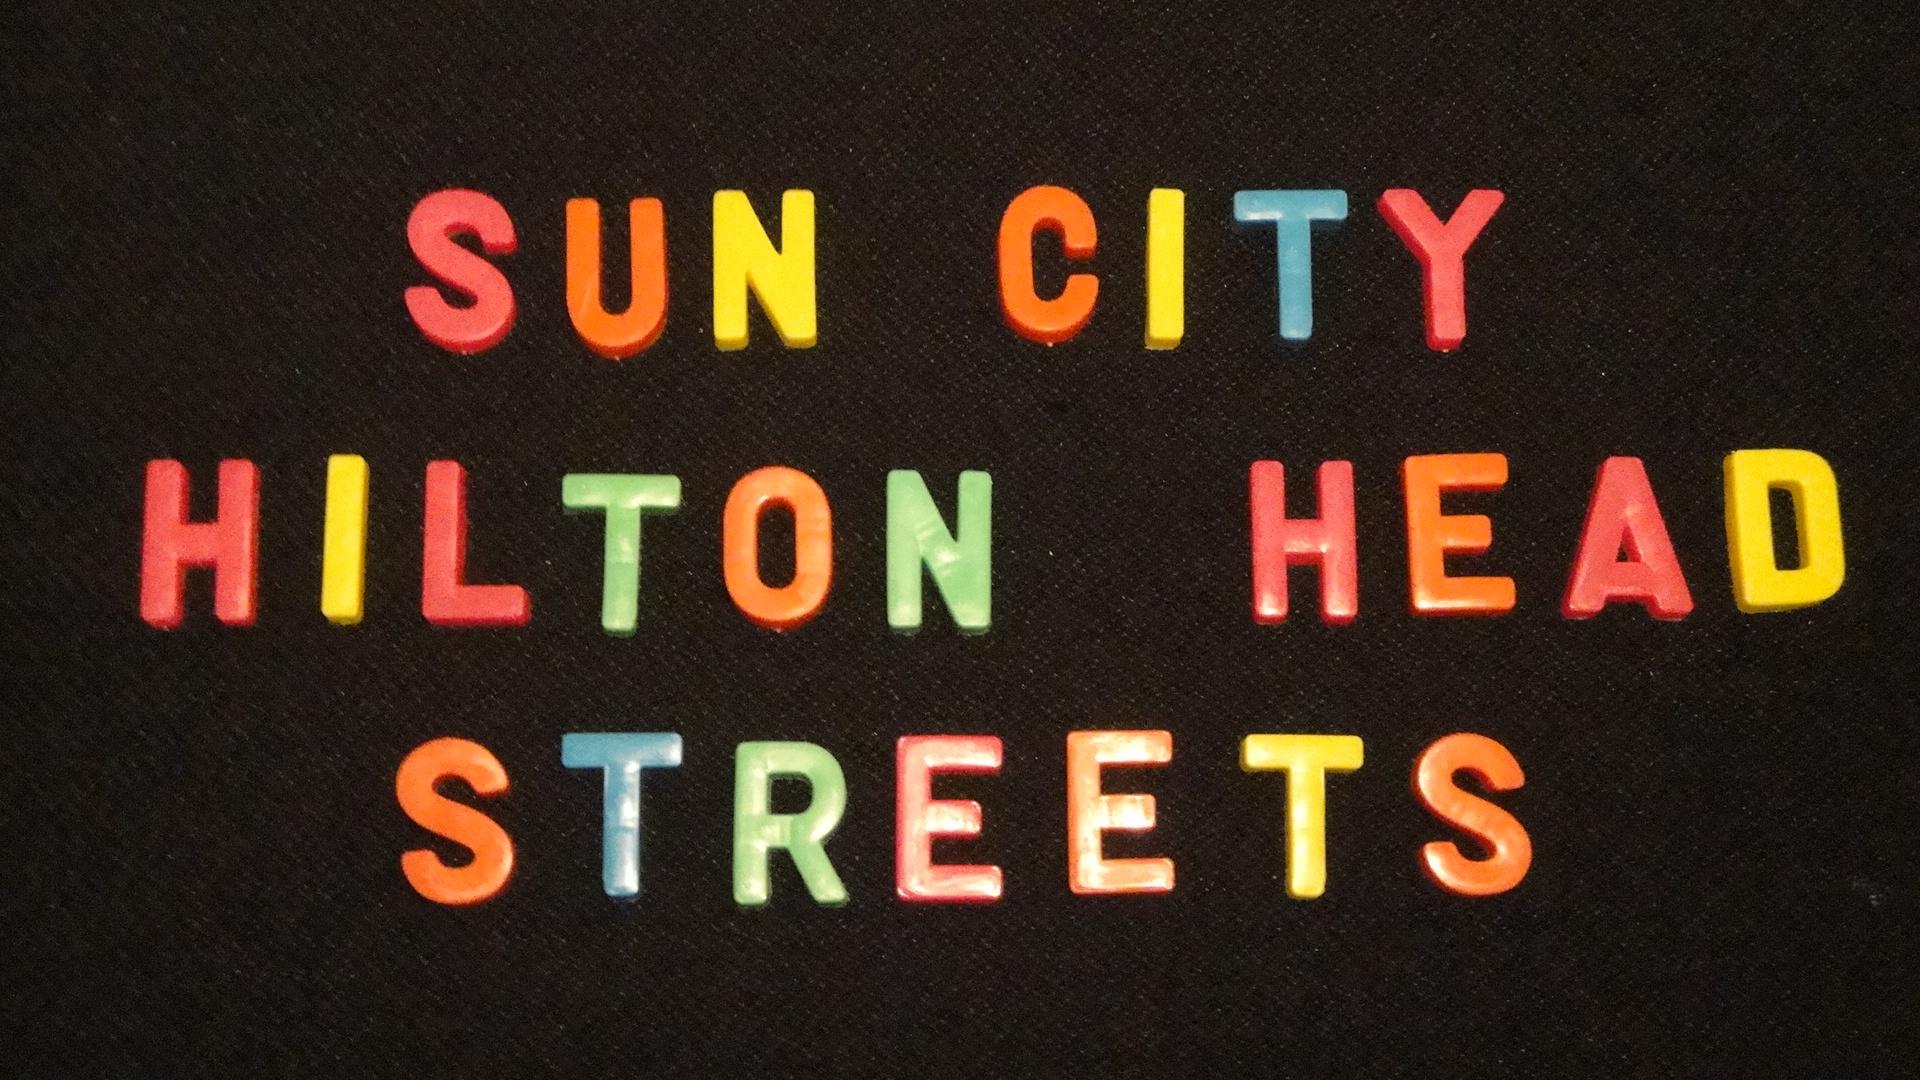 Sun City Hilton Head Streets